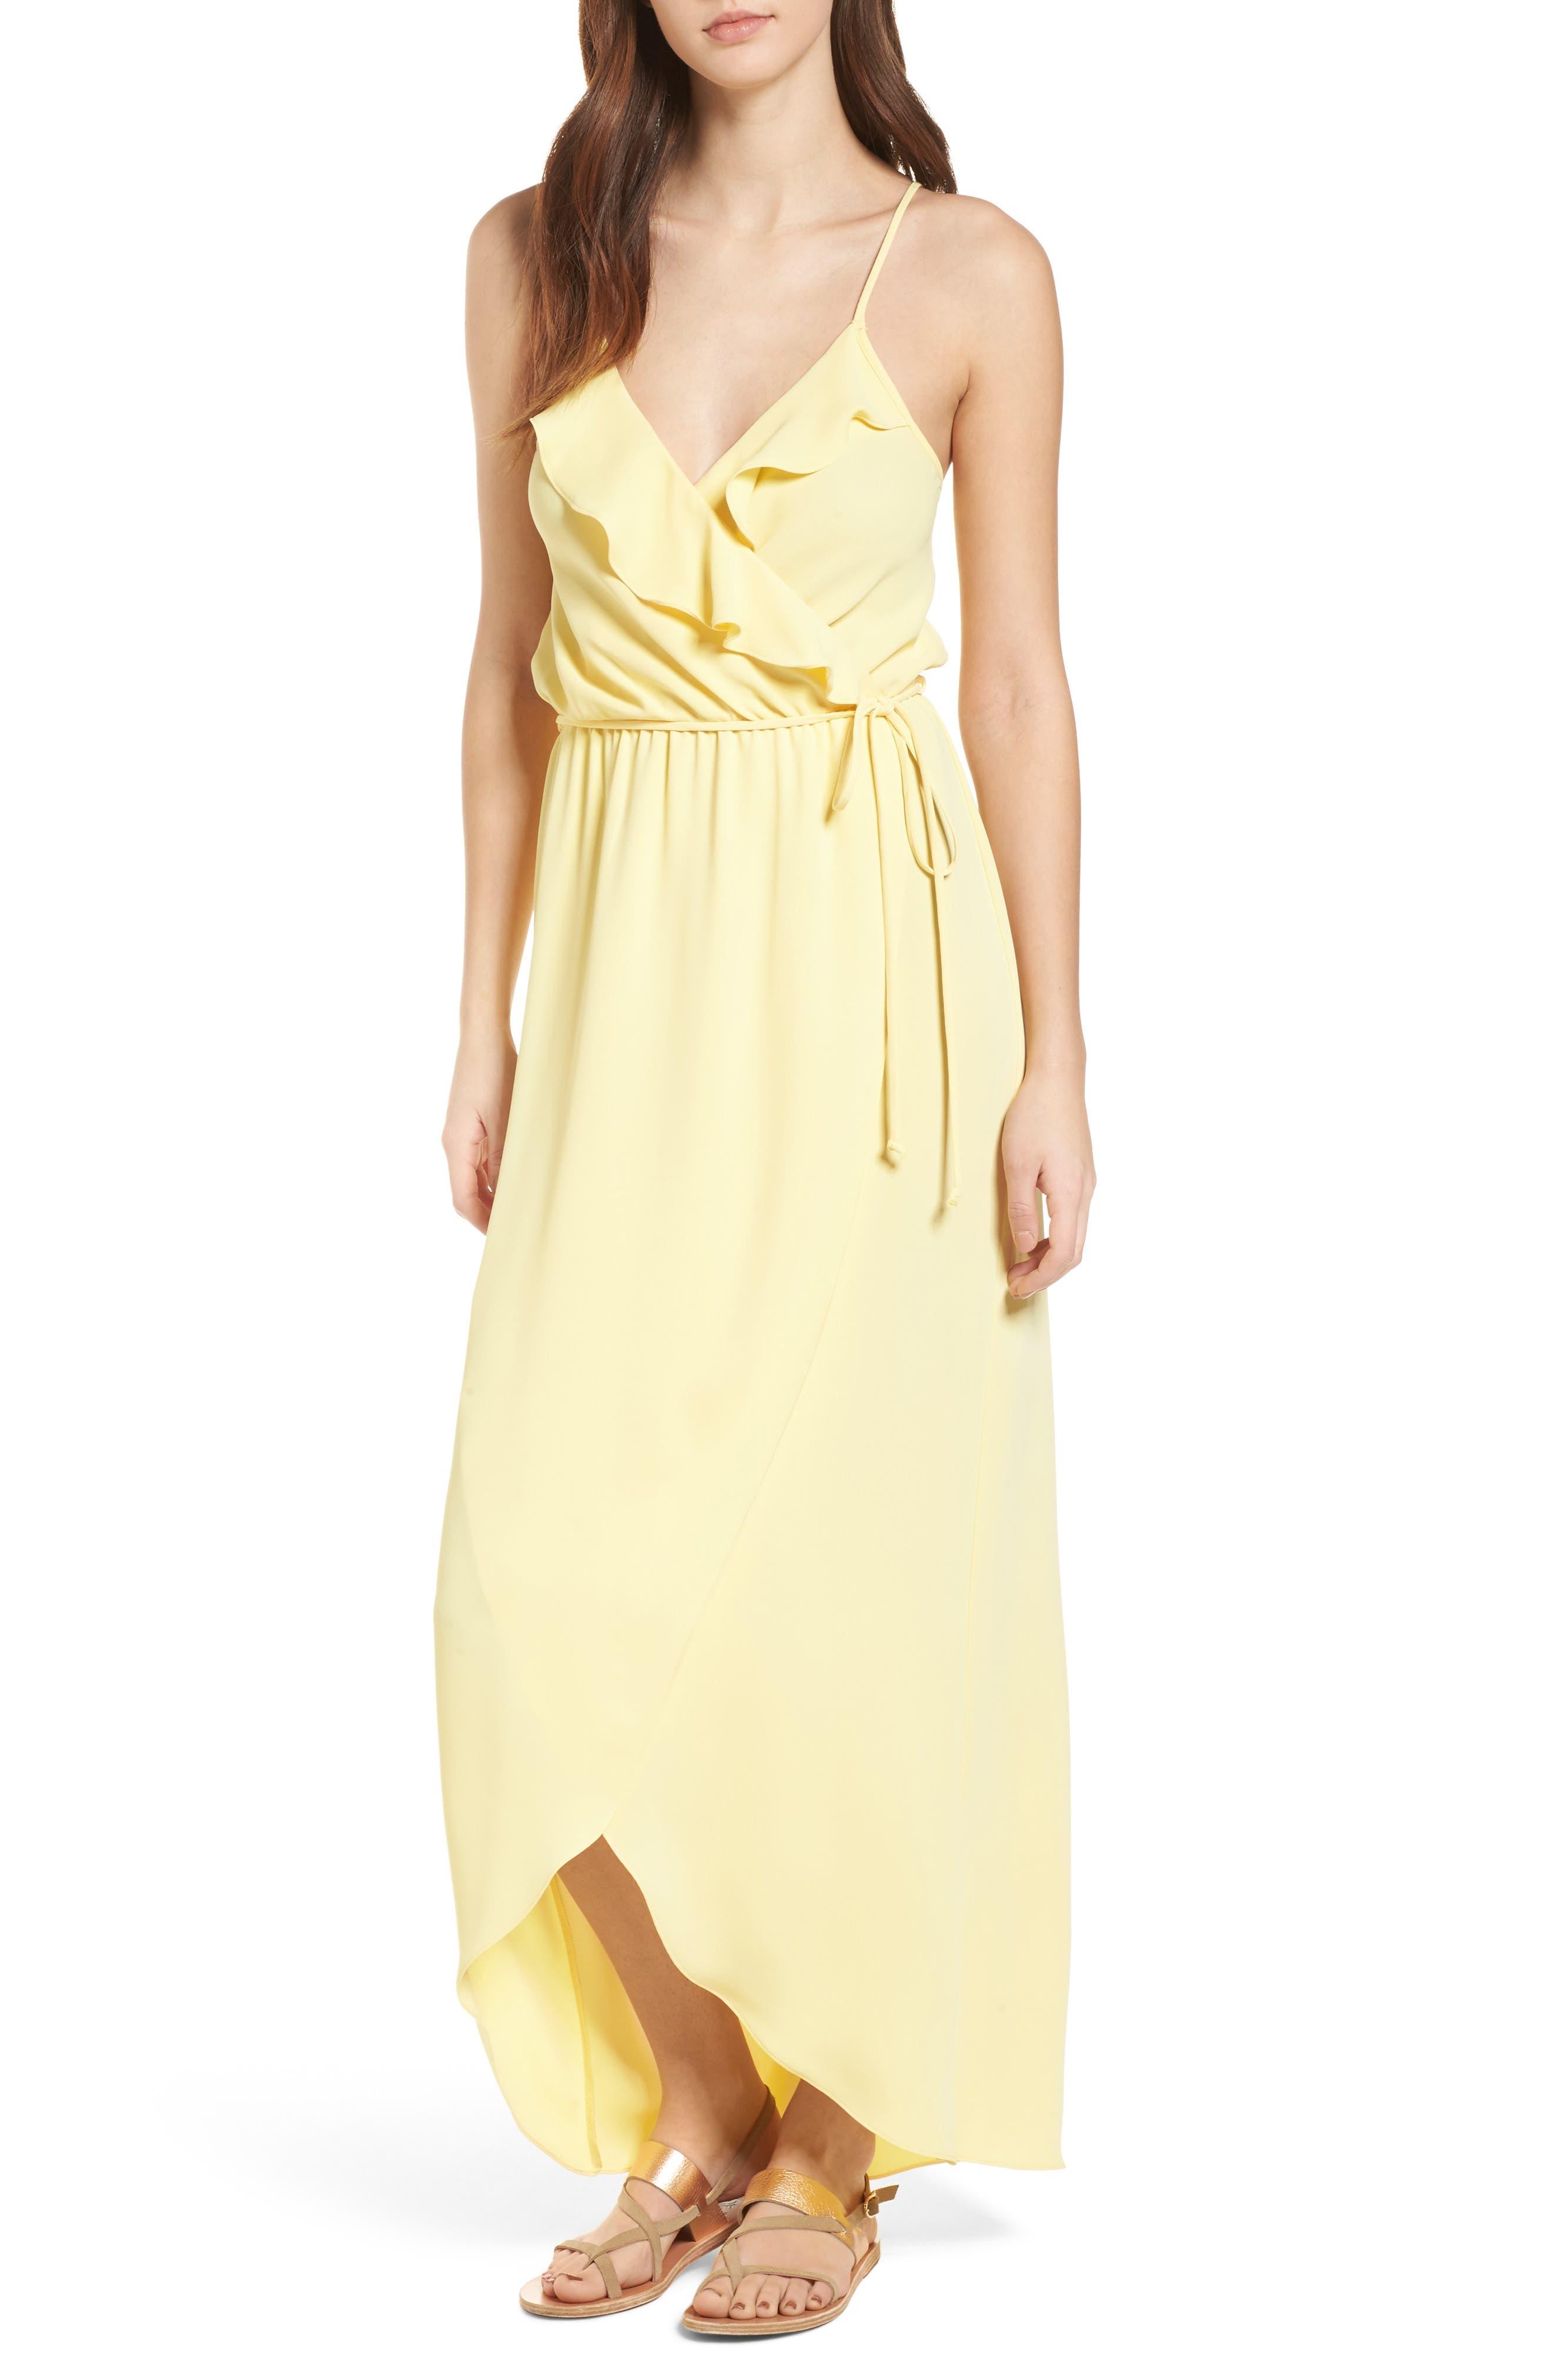 Alternate Image 1 Selected - Everly Ruffle Wrap Maxi Dress